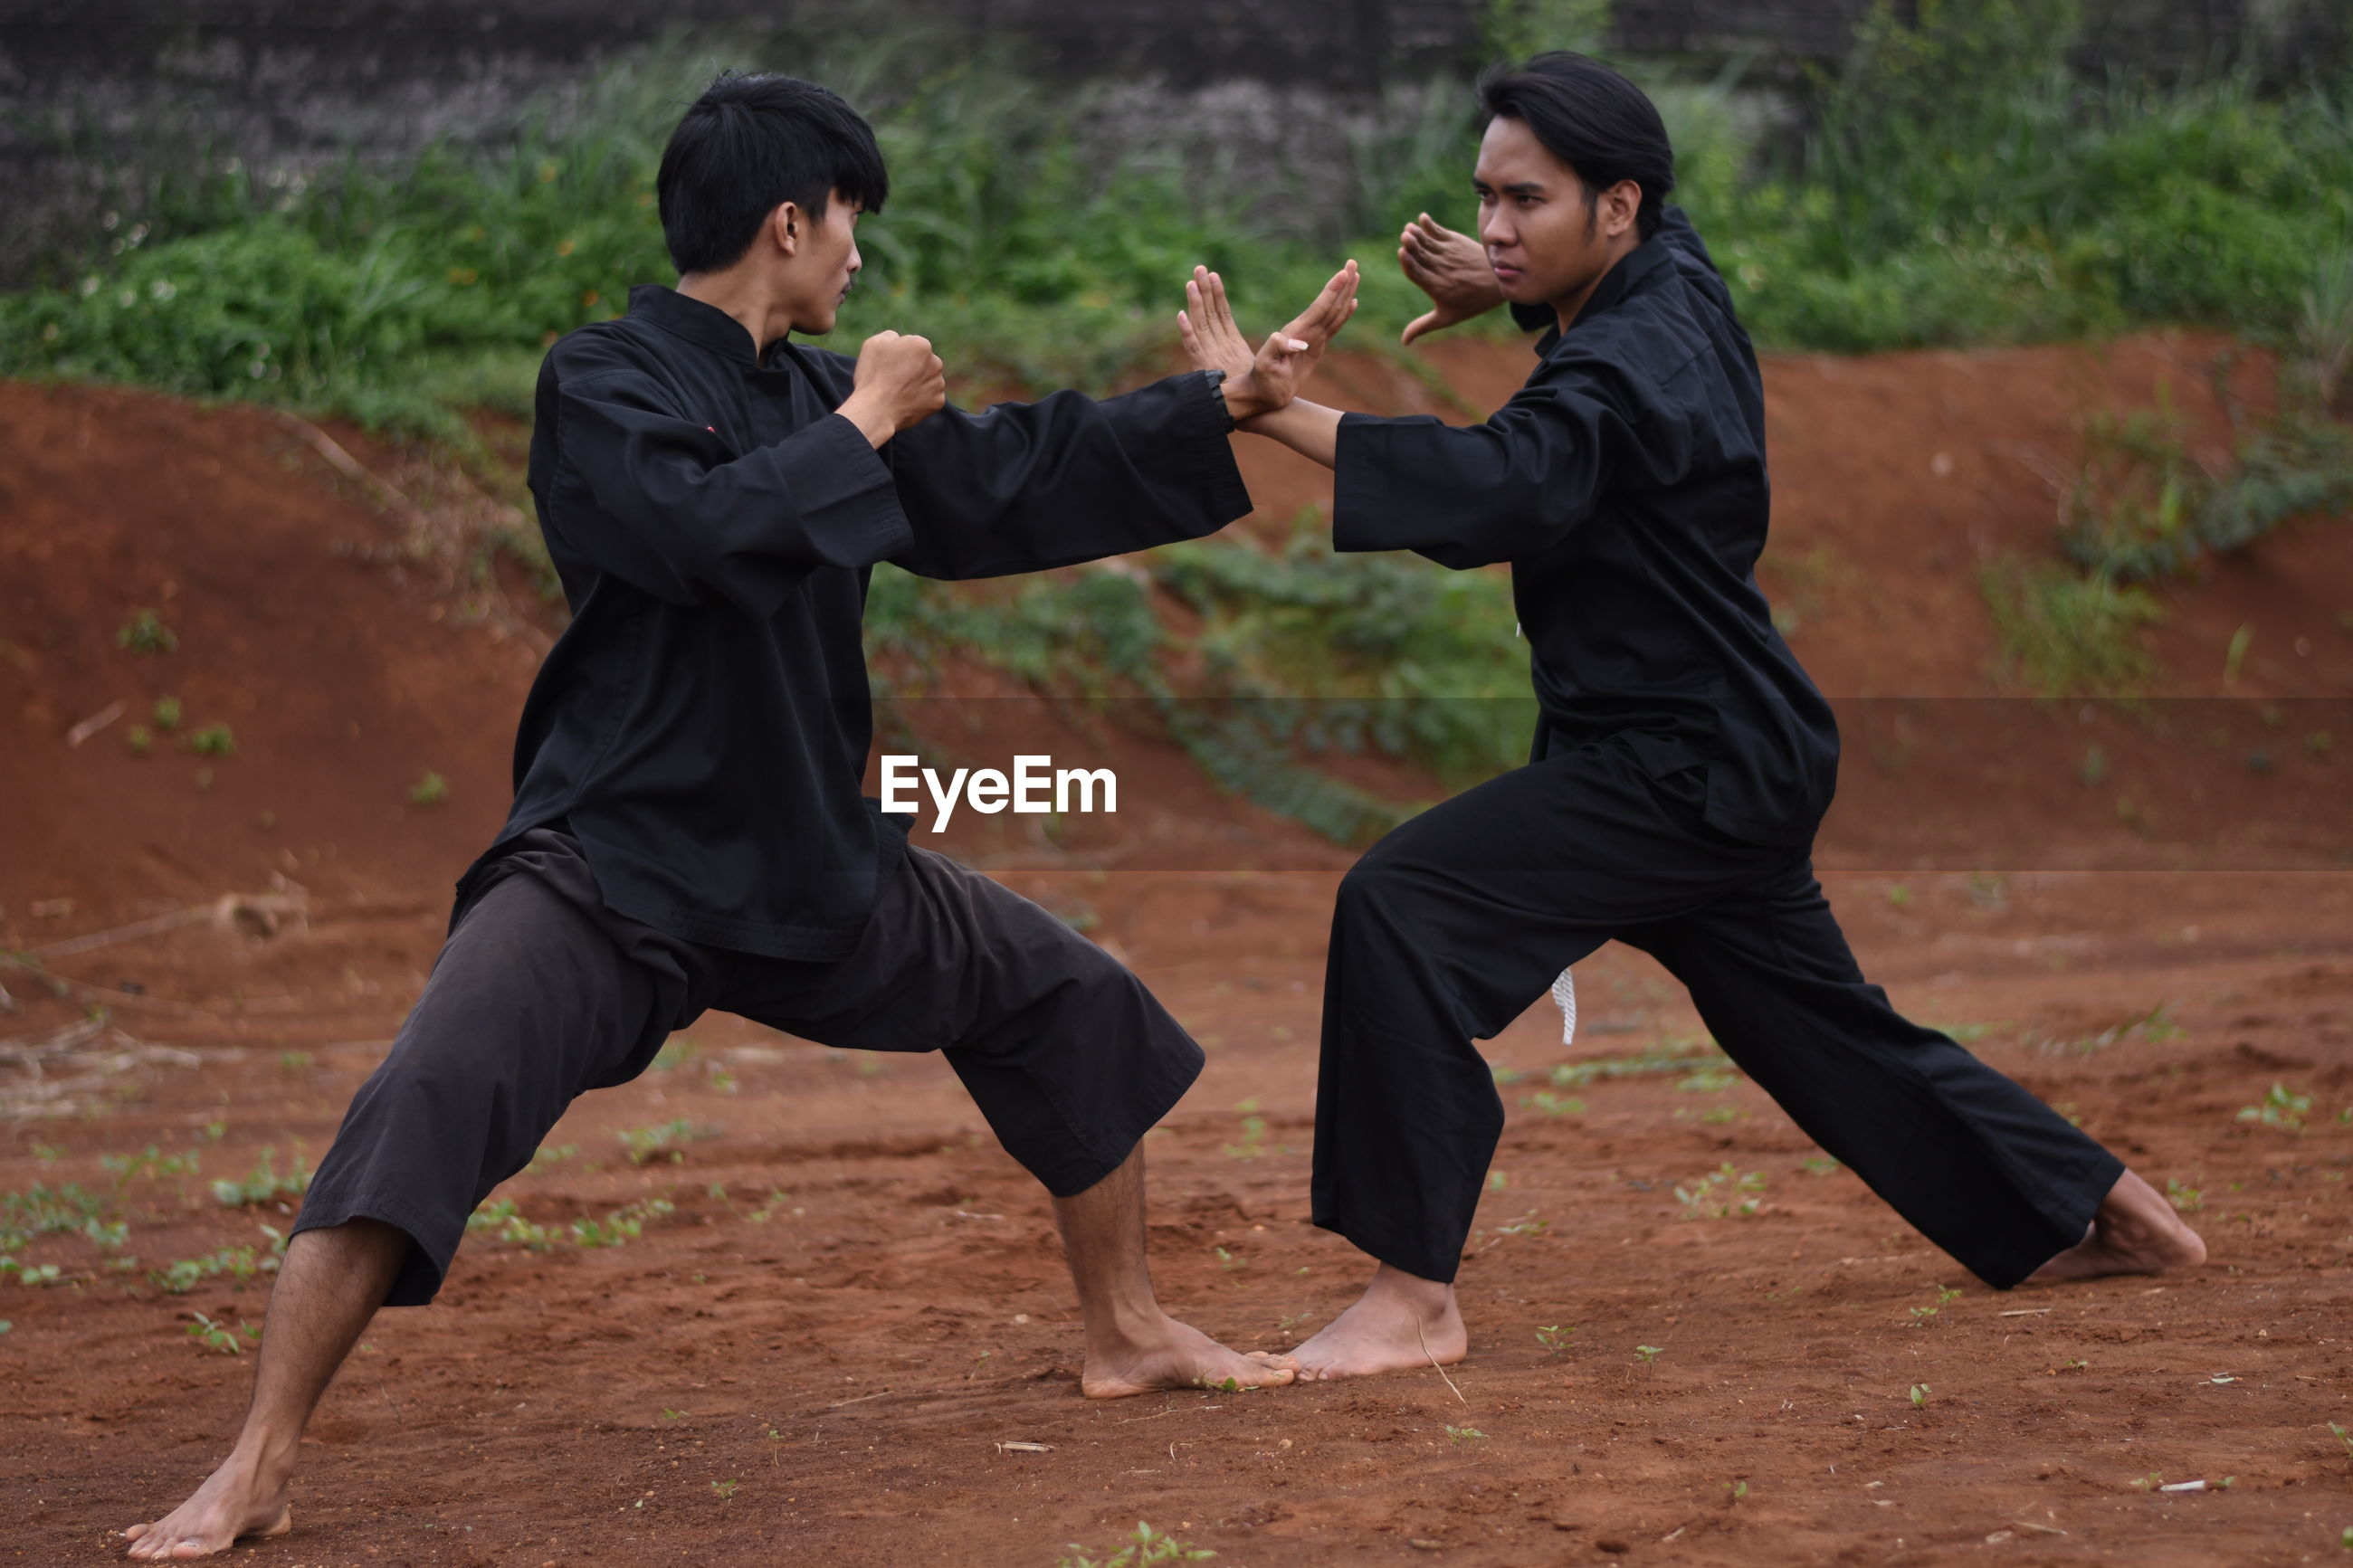 Young men practicing karate outdoors